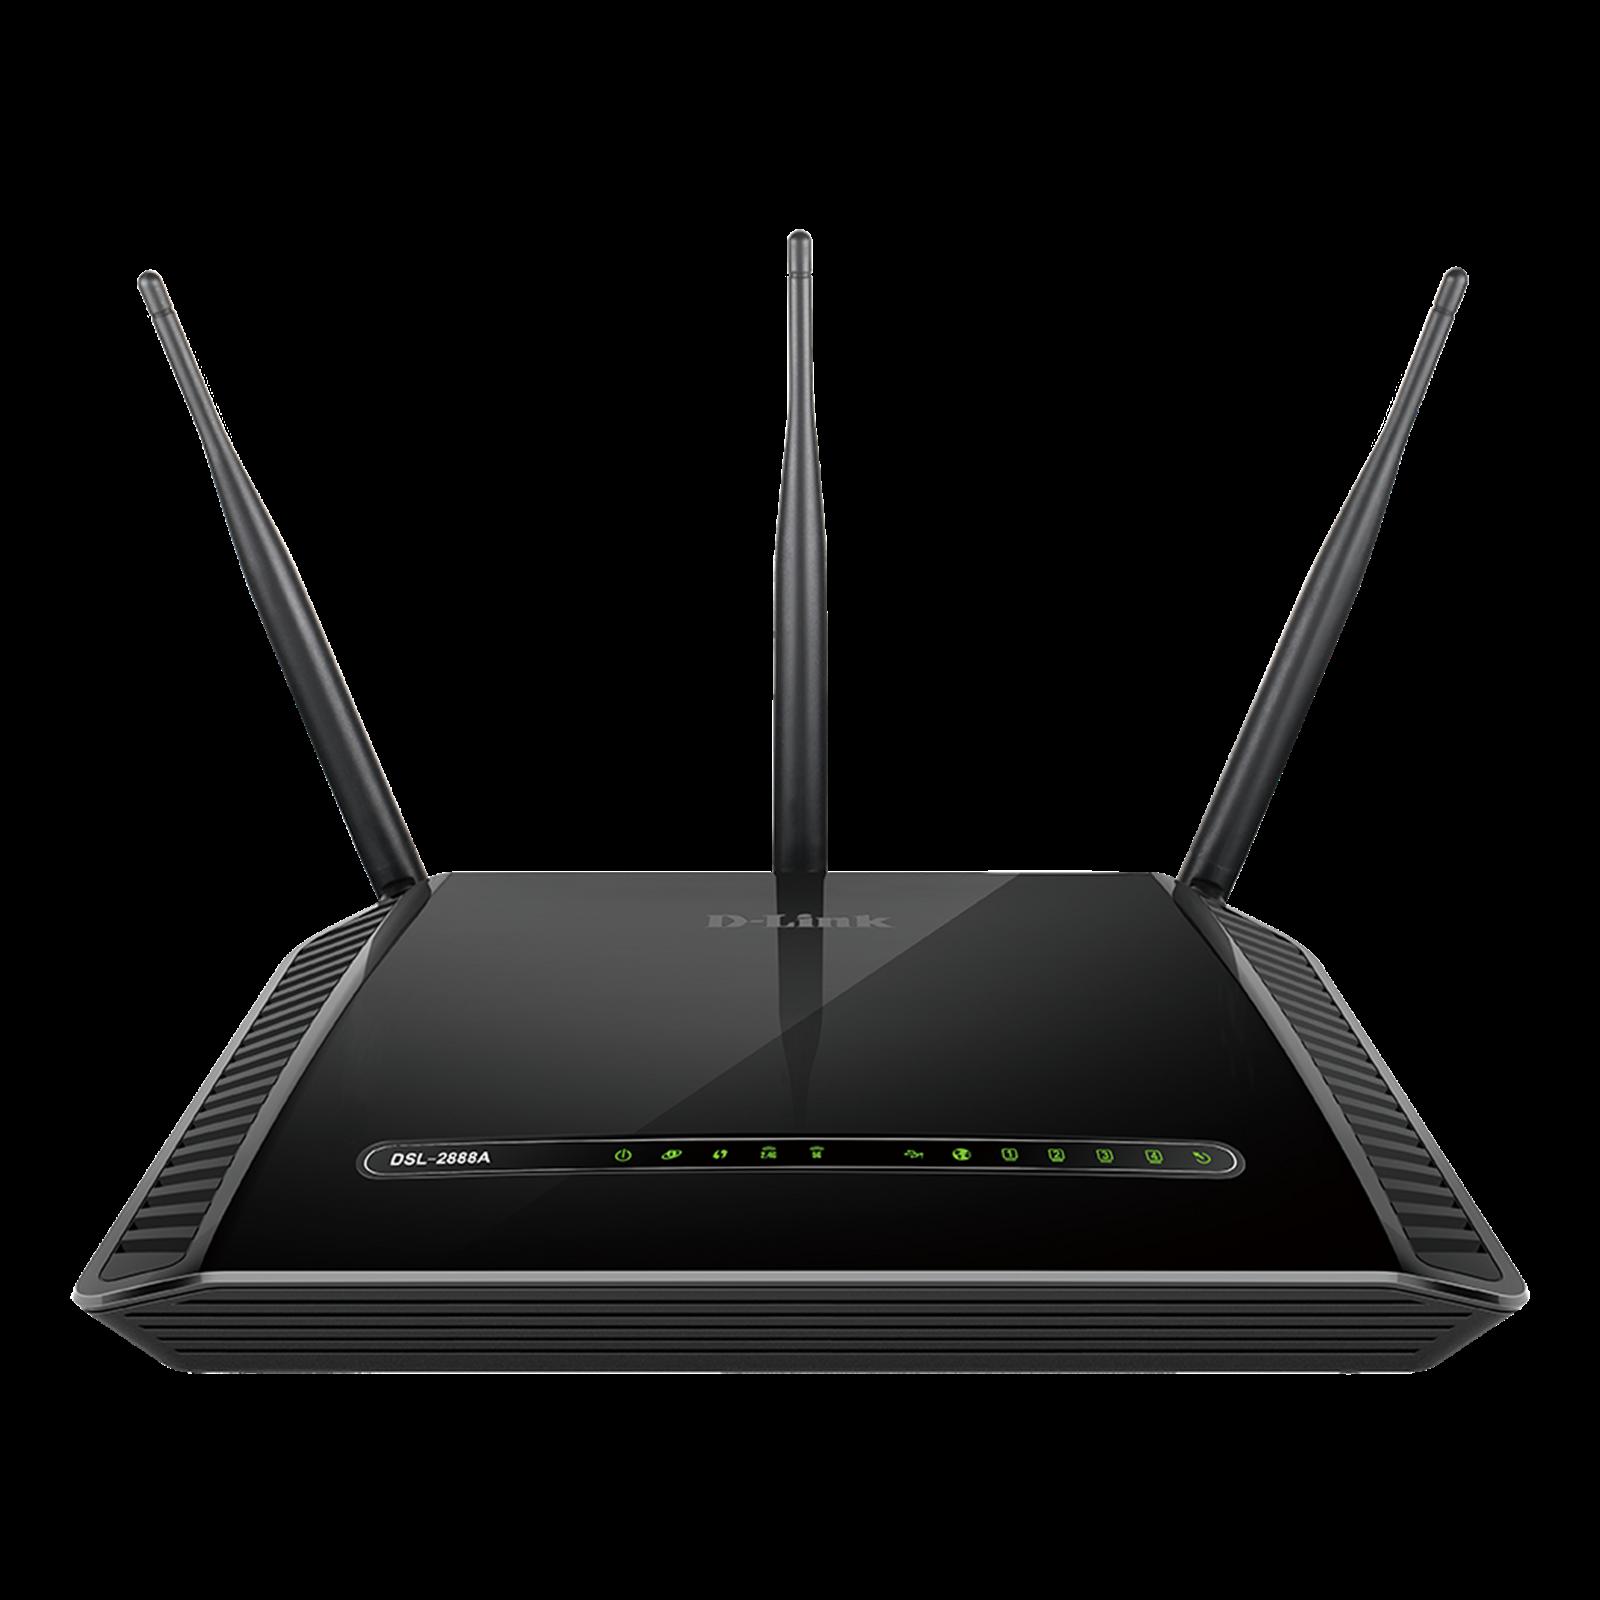 D-LINK PYTHON Dual Band Wireless AC1600 Gigabit ADSL2+/VDSL2 DSL-2888A Modem Router